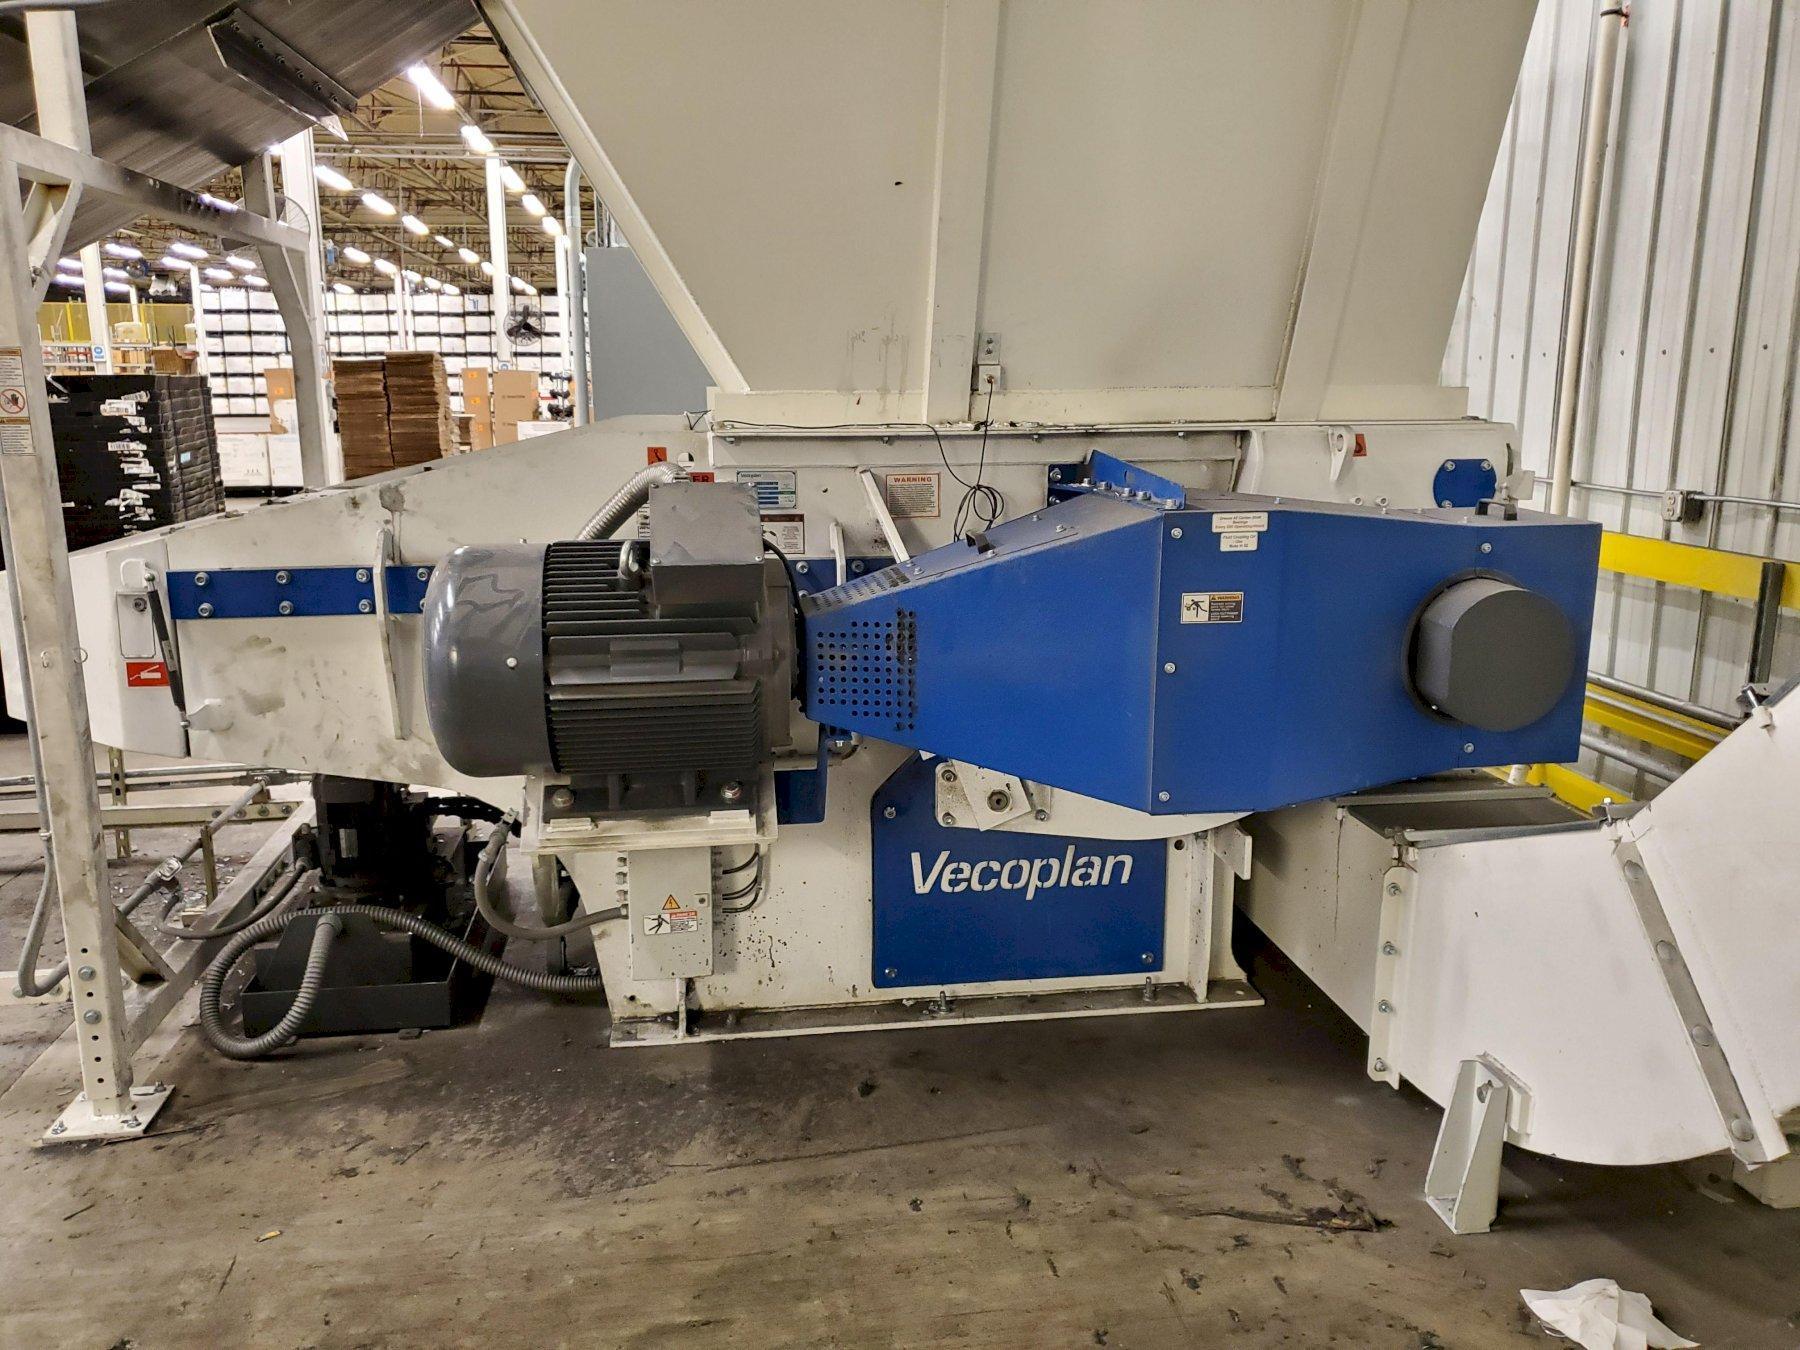 "52"" Used Shredding/Grinding Line with Vecoplan VAZ1300-L-XL Shredder & 150HP Rotogran Granulator, Yr. 2018"